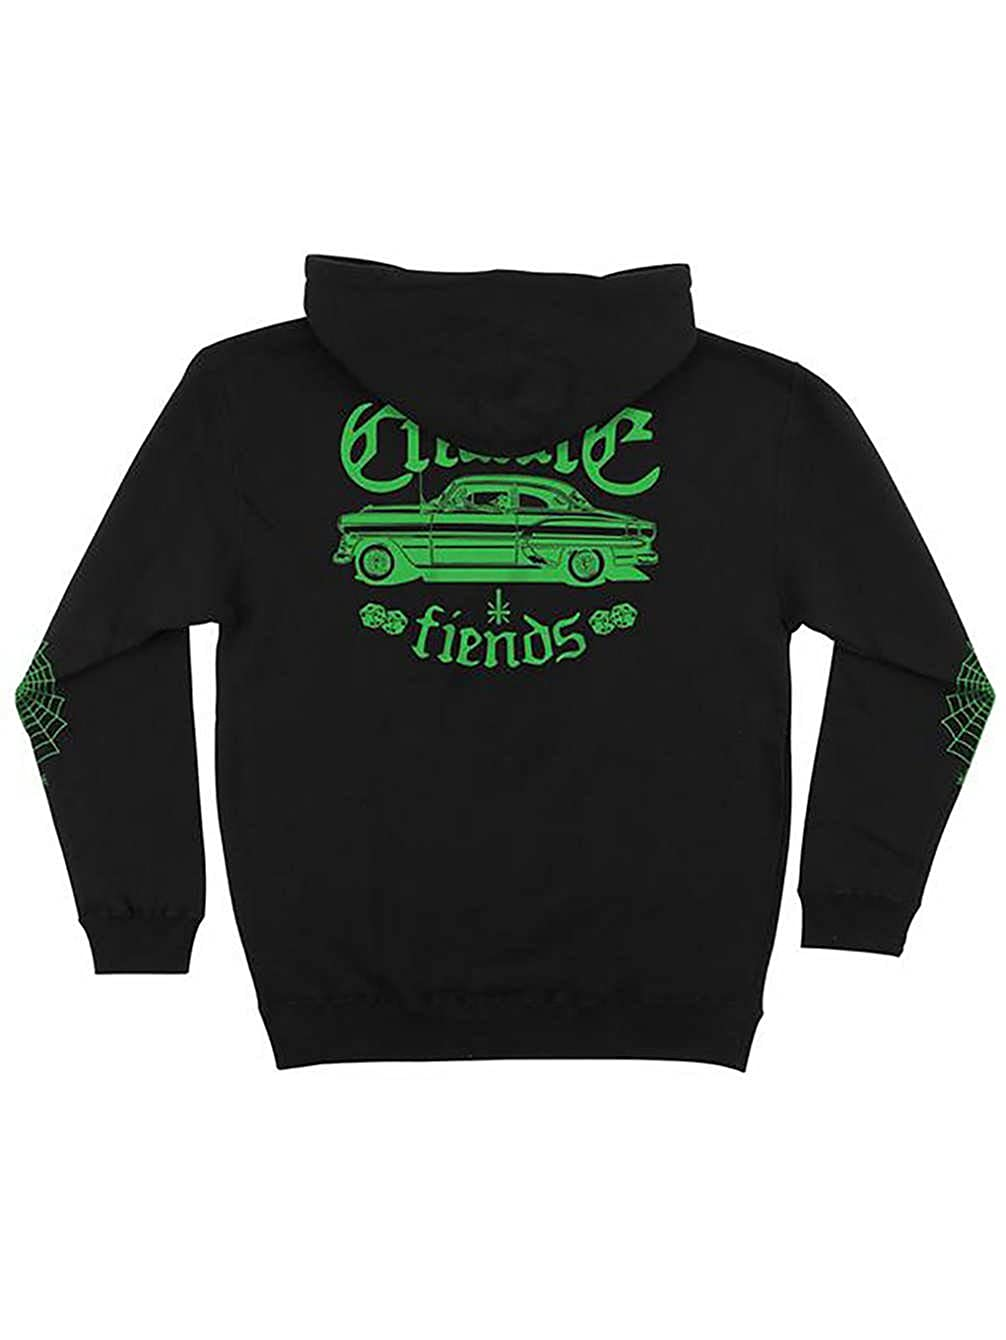 Creature Mens Car Club Hoody Pullover Sweatshirts